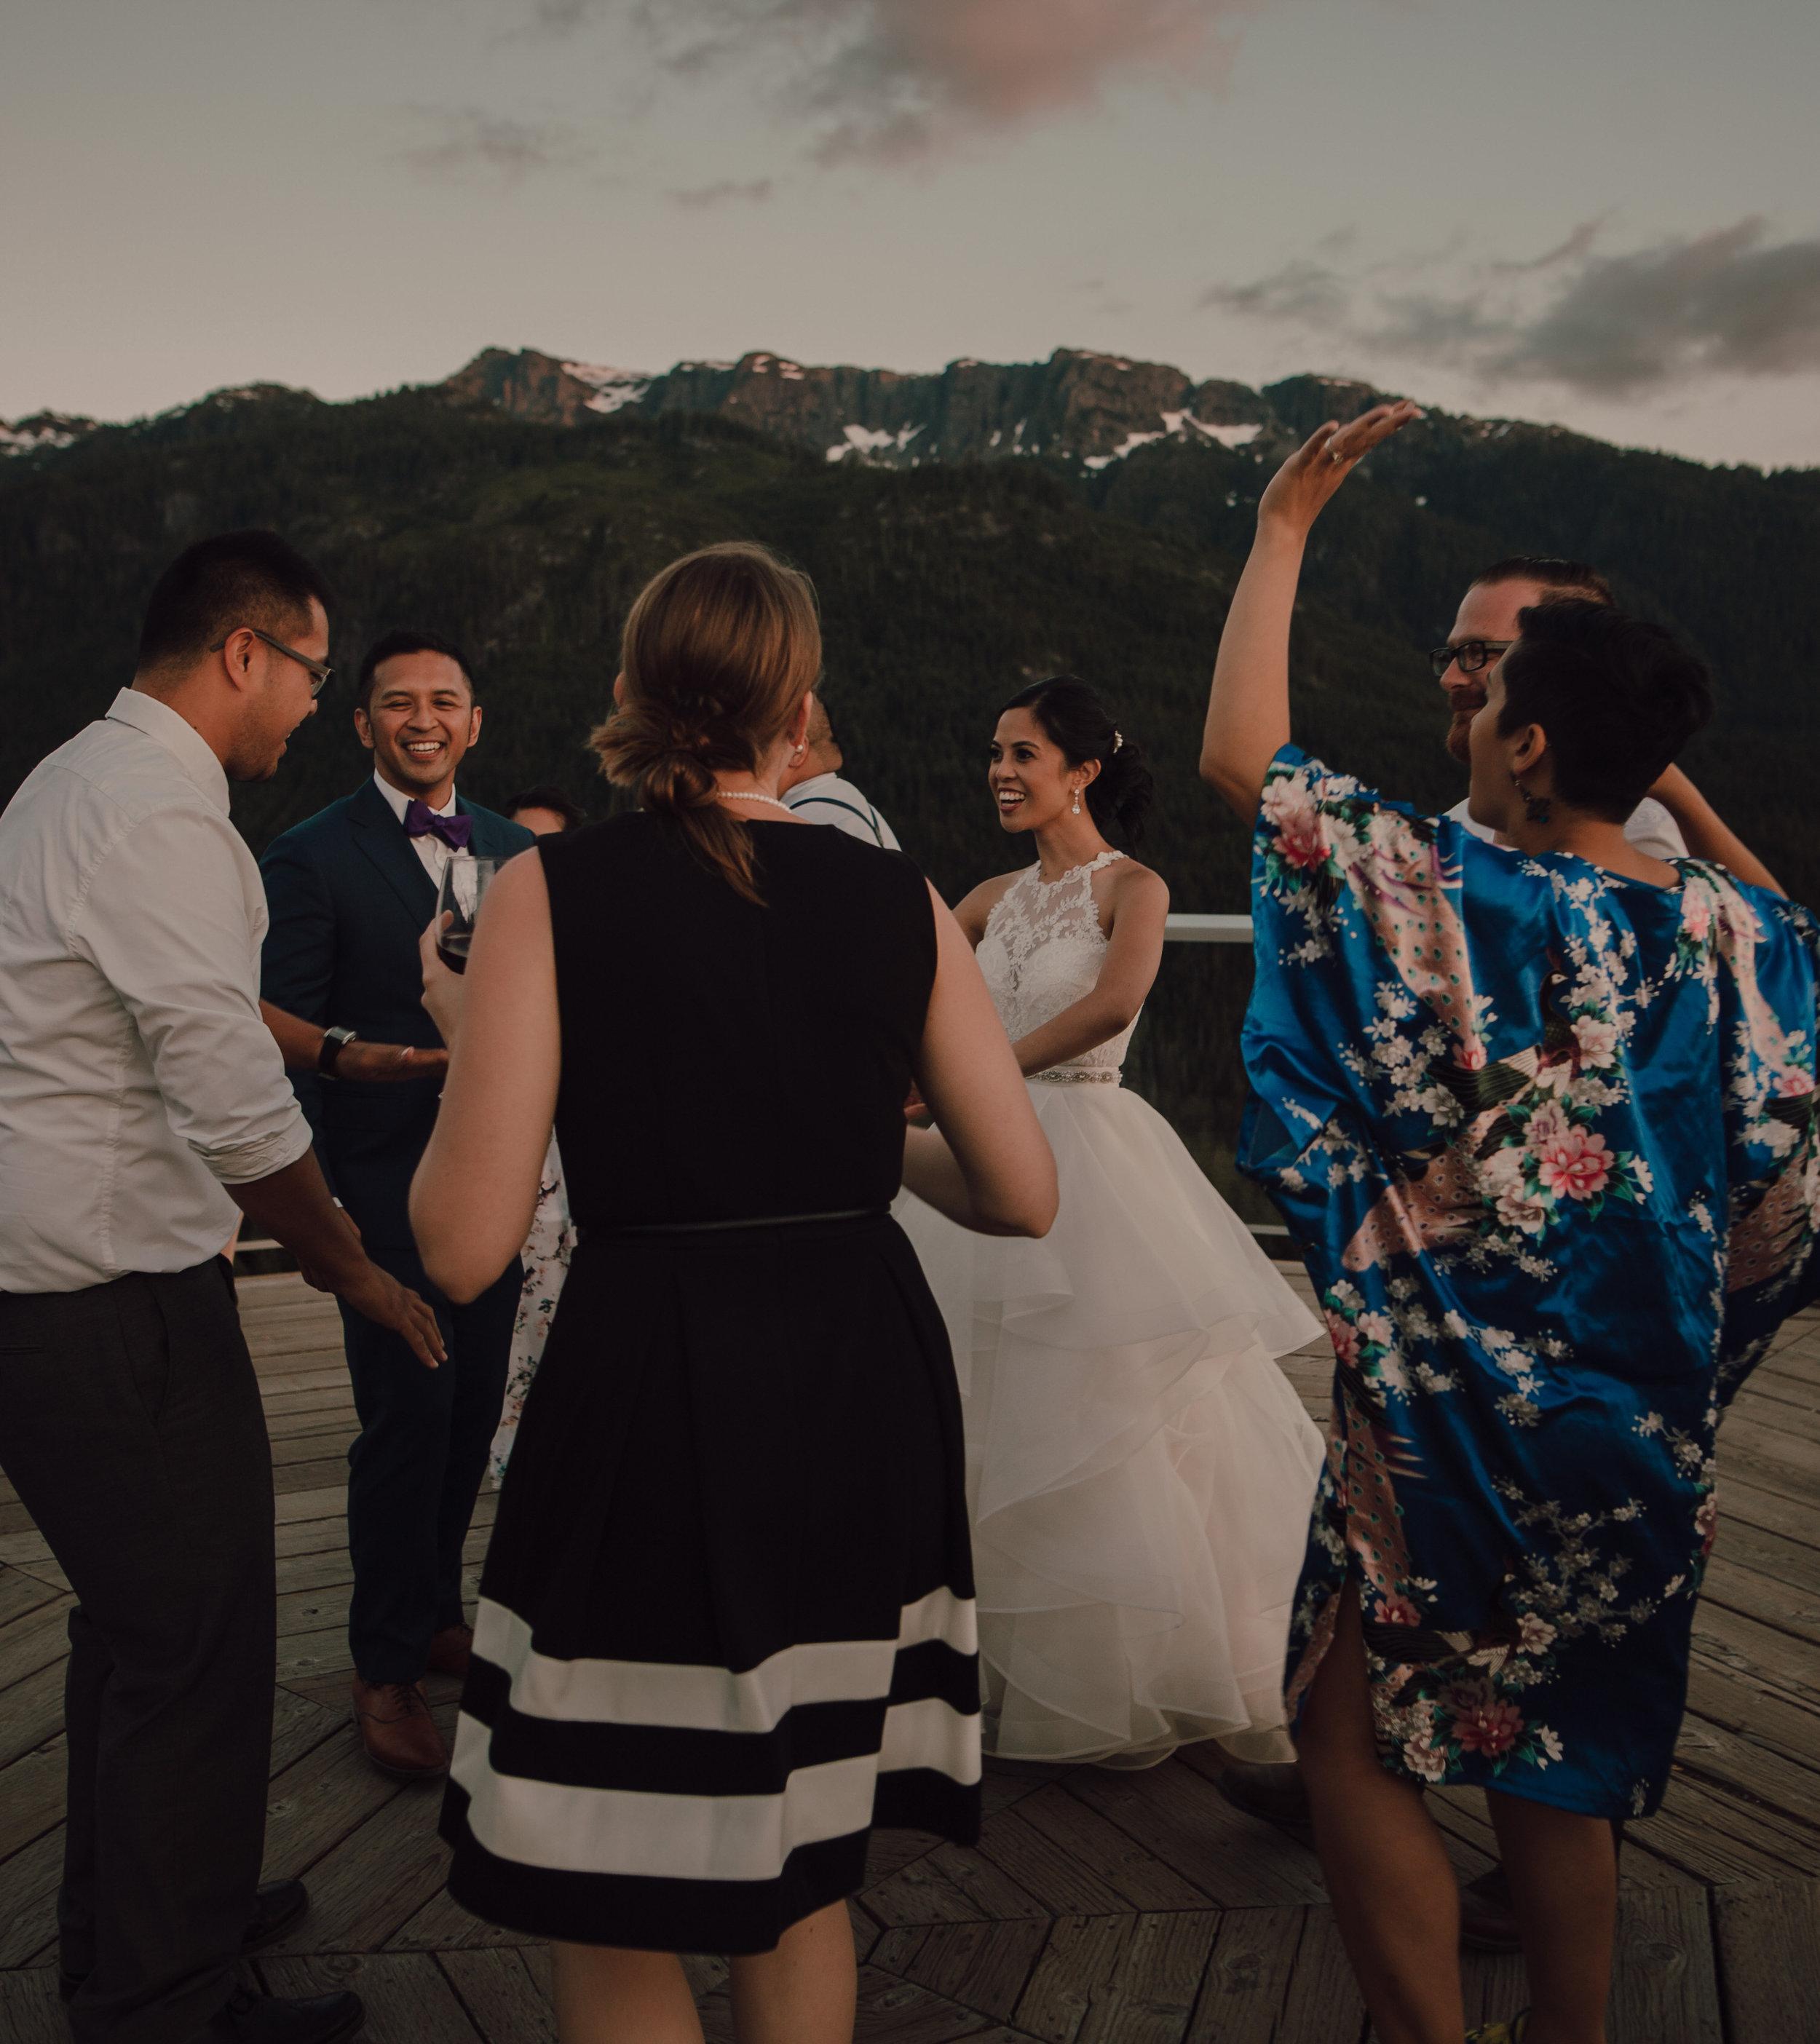 Squamish Wedding Photographer - Sea to Sky Gondola Wedding Photos -  Vancouver Wedding Photographer & Videographer - Sunshine Coast Wedding Photos - Sunshine Coast Wedding Photographer - Jennifer Picard Photography - IMG_5639.jpg